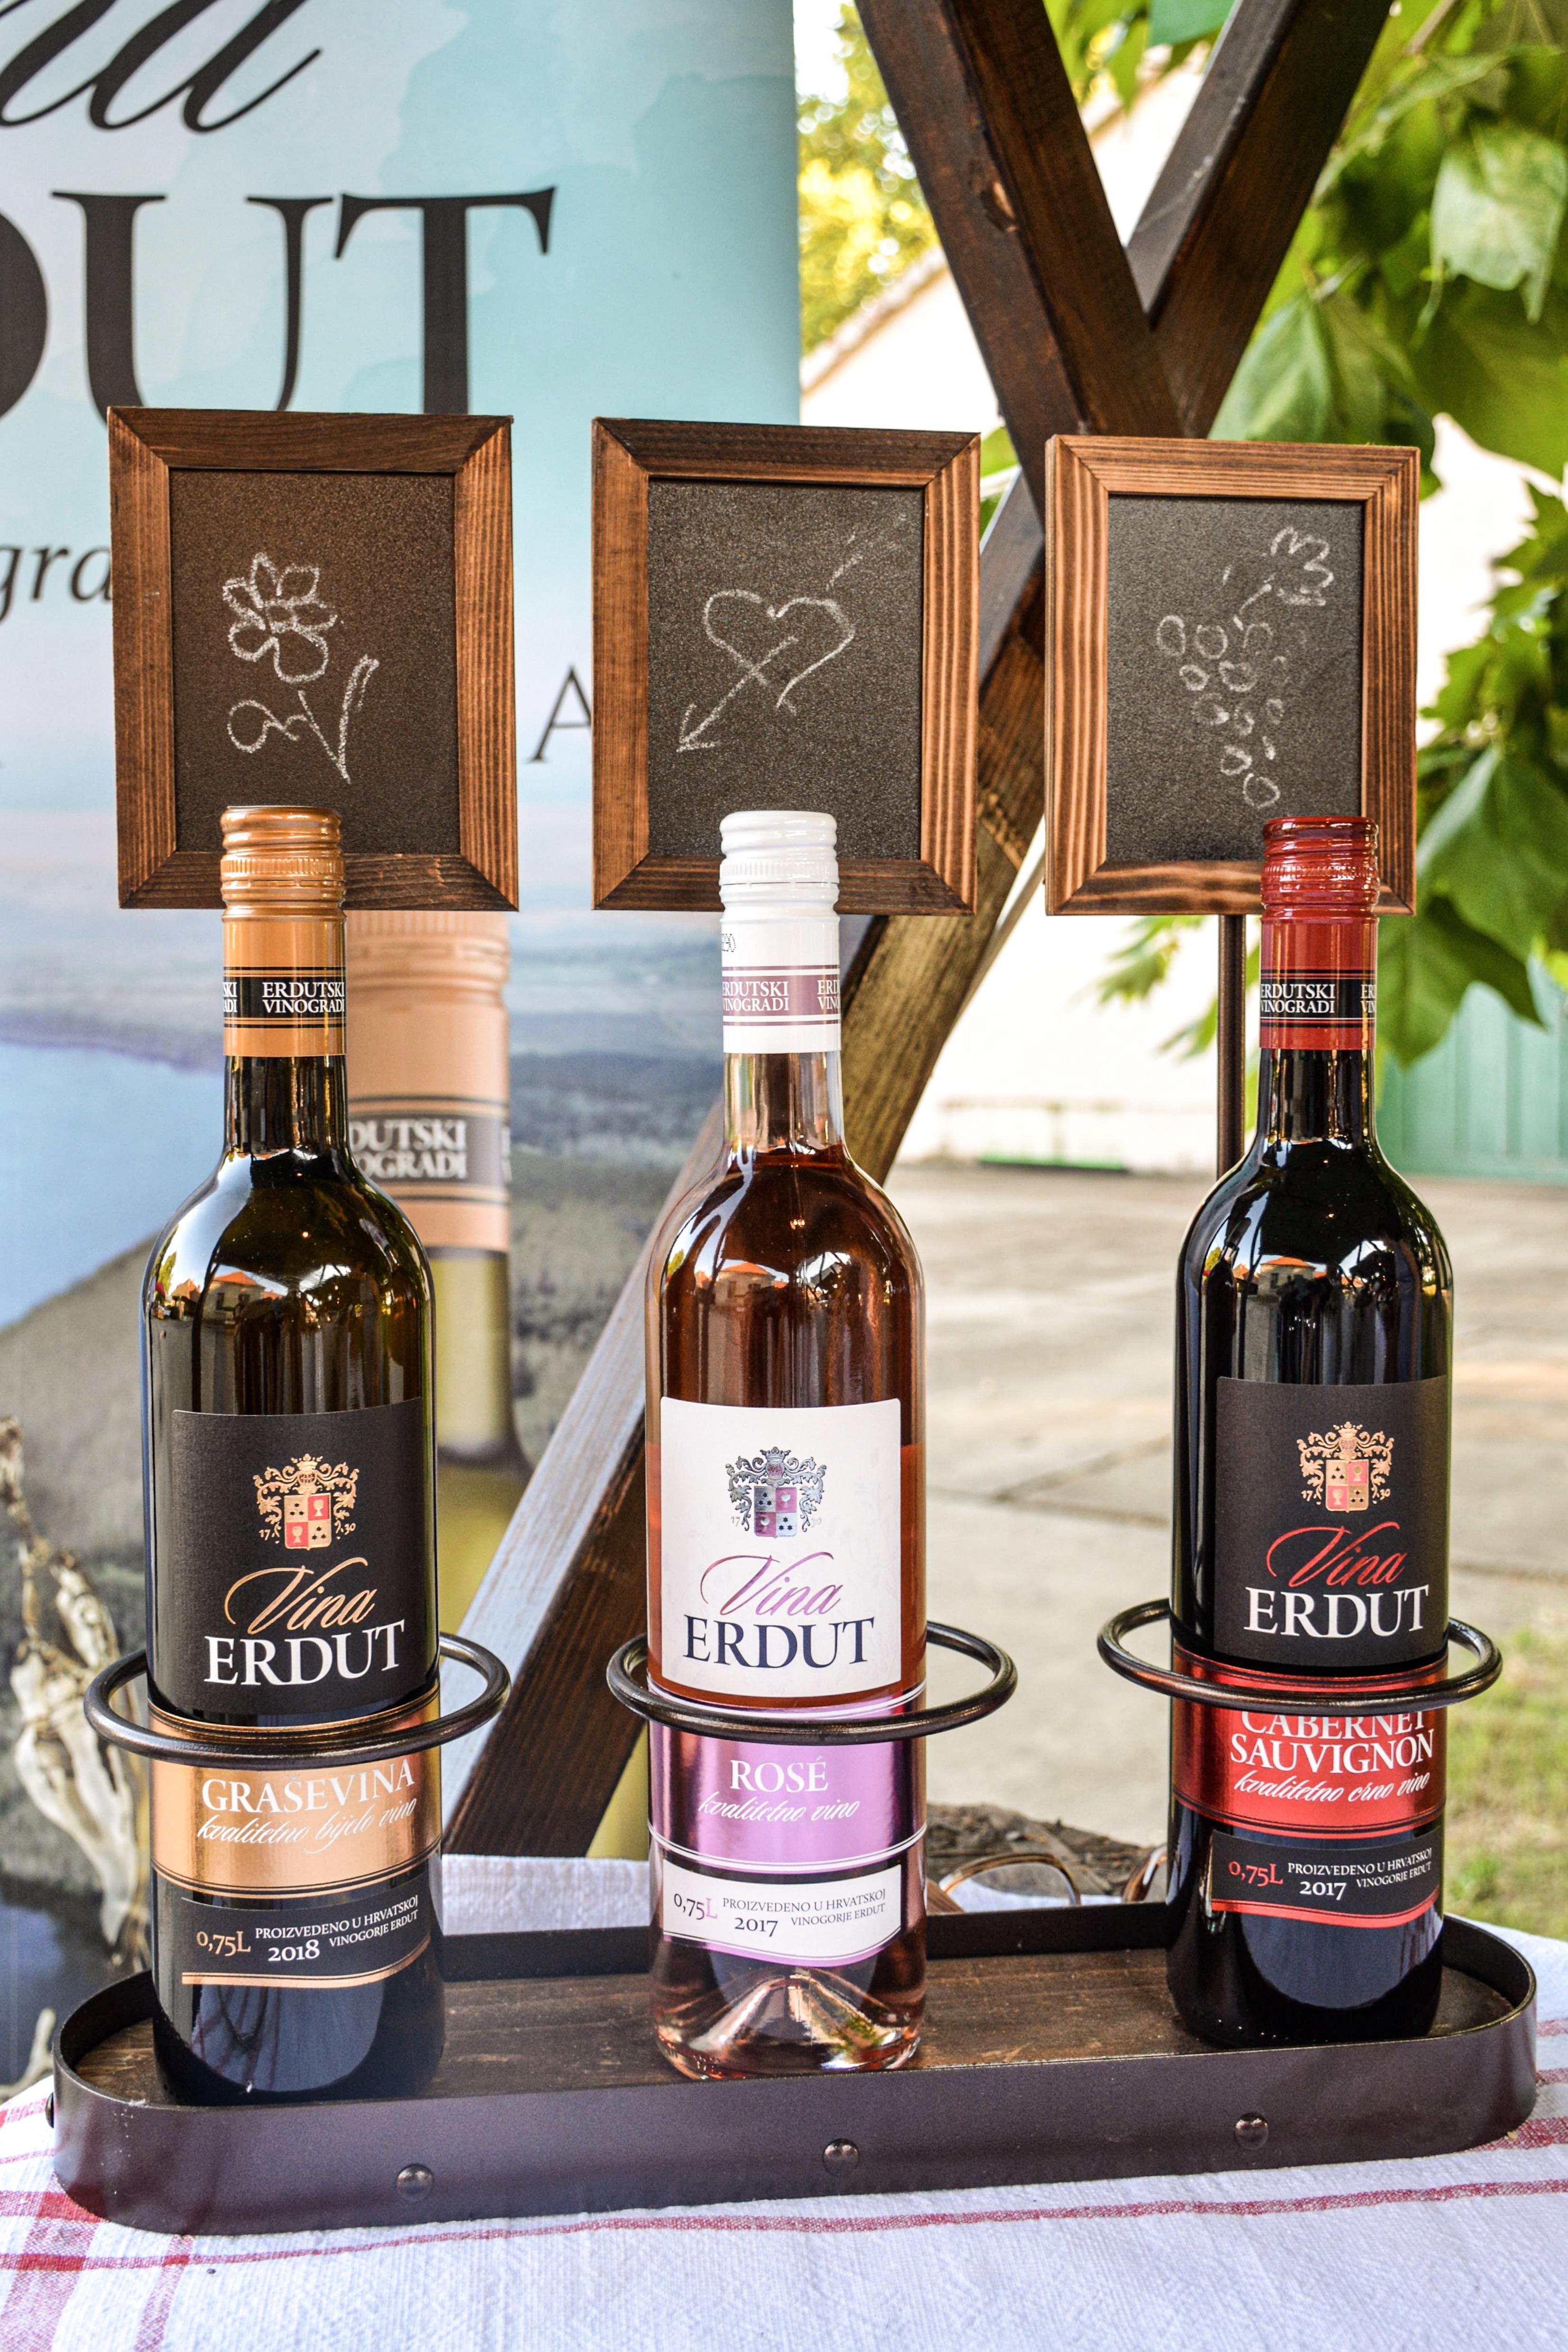 Etikete vinarije Erdut